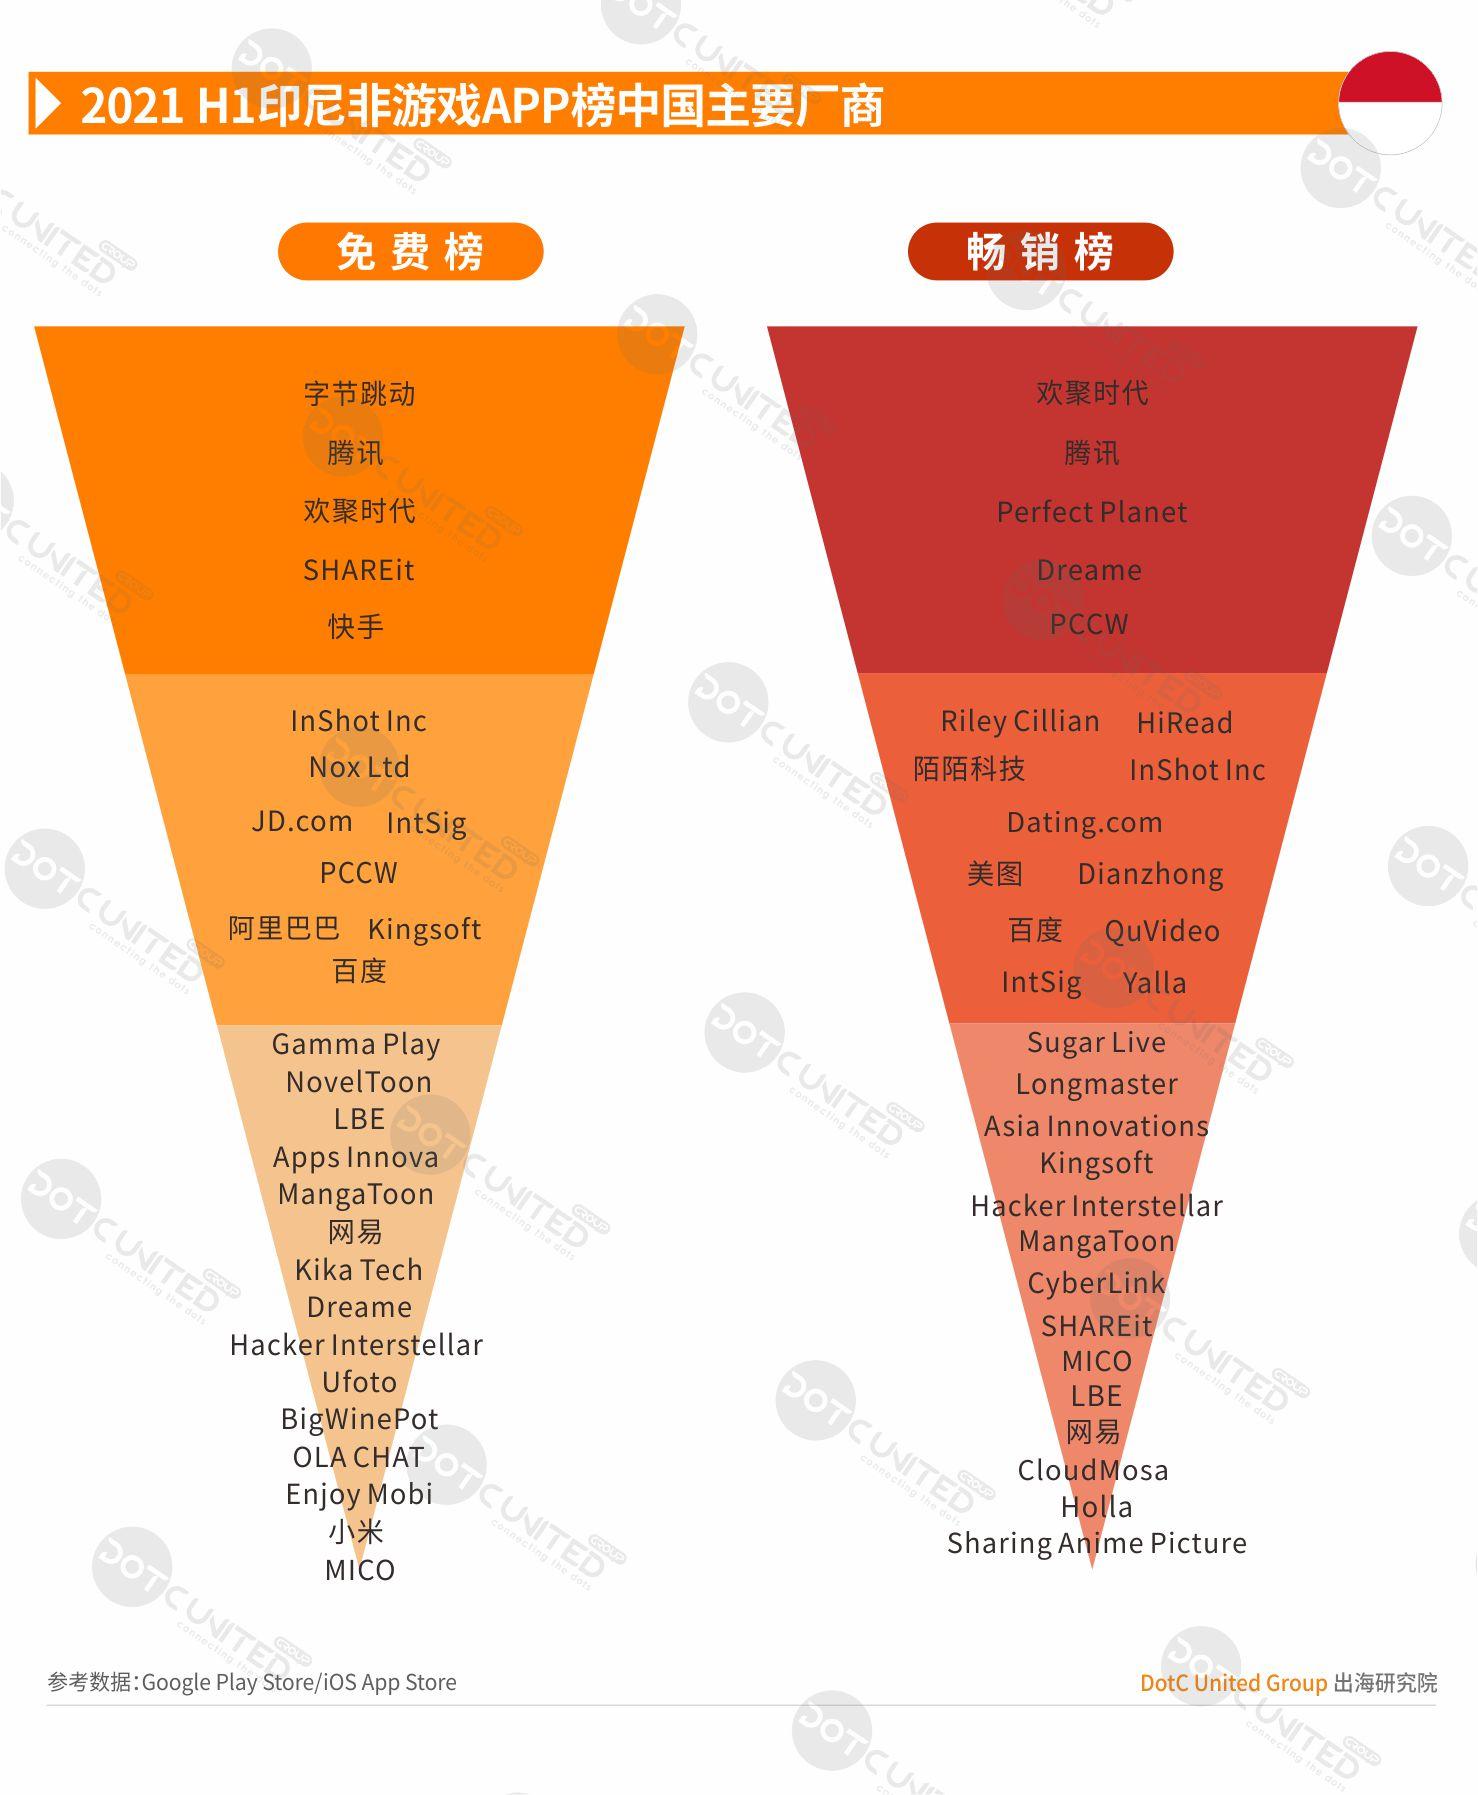 2021 H1 中国APP出海启示录—印尼-Gamewower